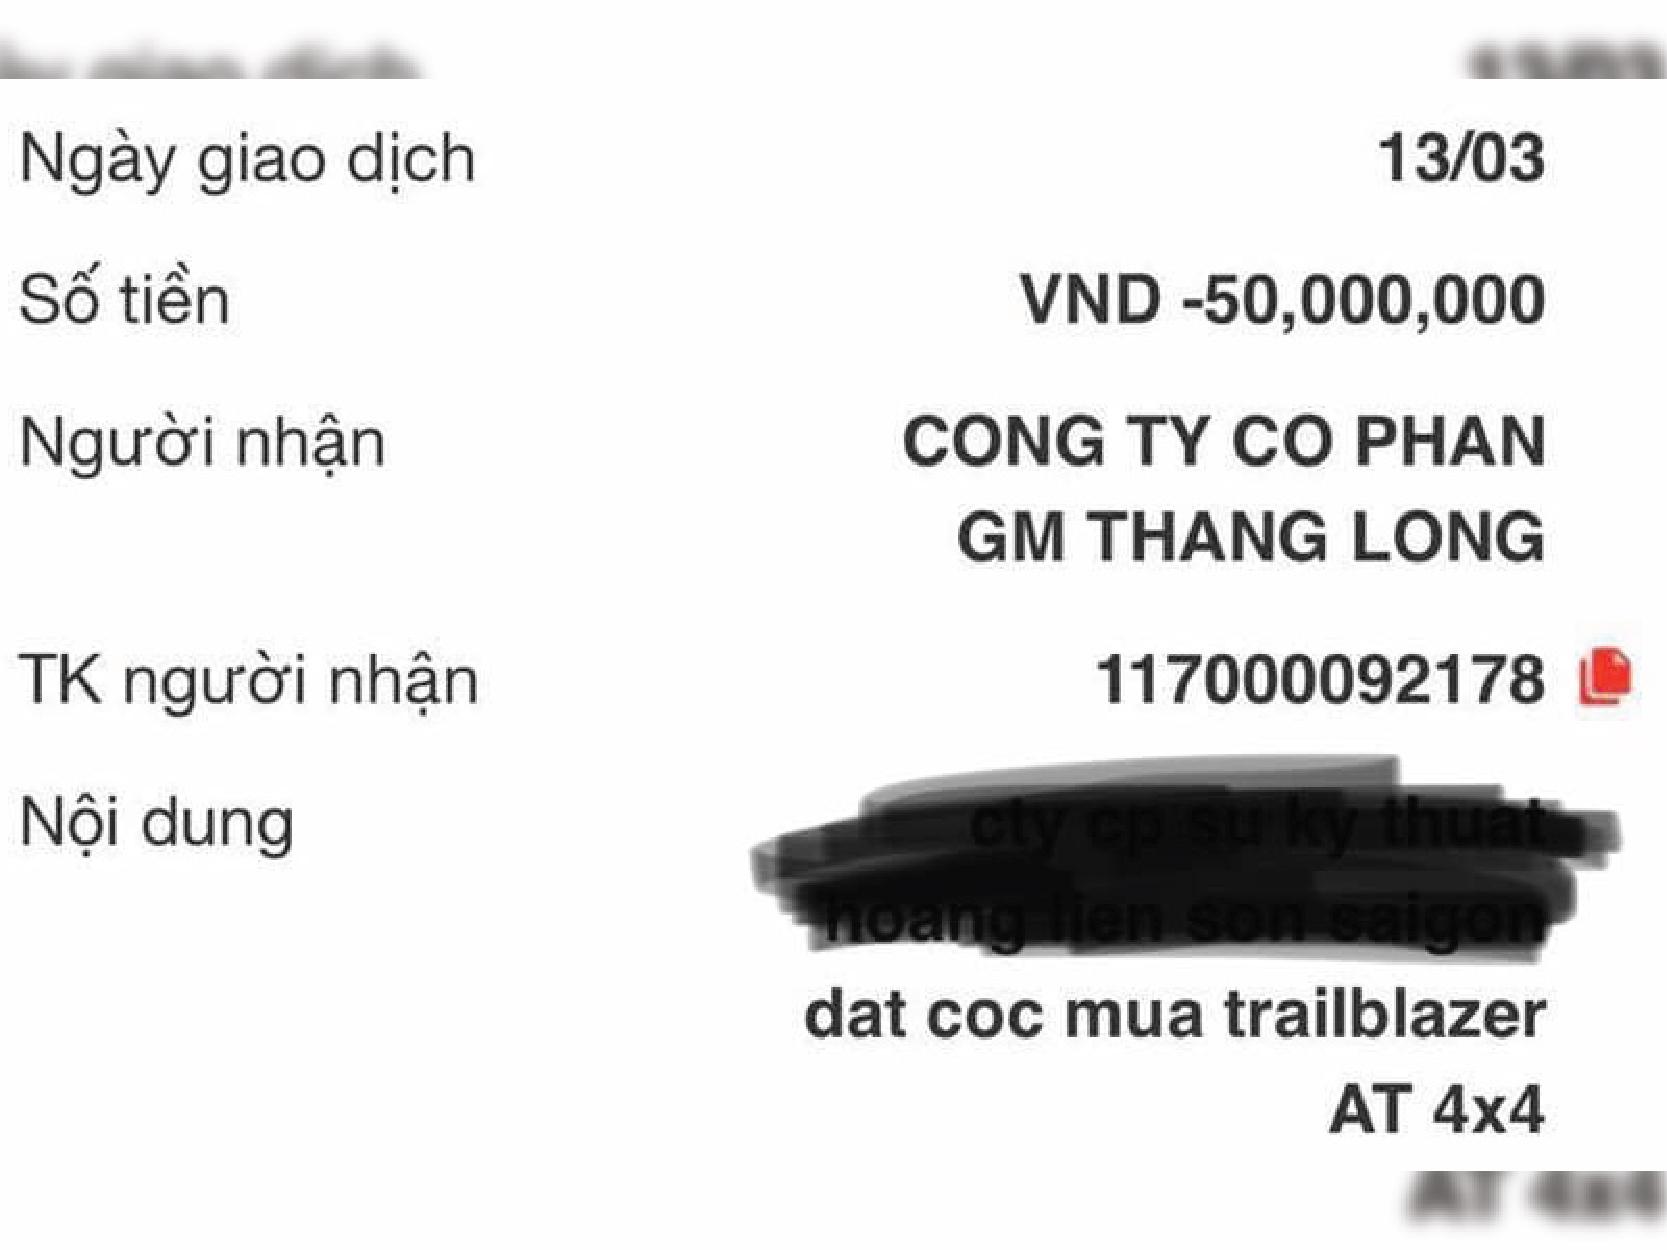 tung-la-doi-trong-fortuner-gio-day-chevrolet-trailblazer-chi-con-hon-700-trieu-dong